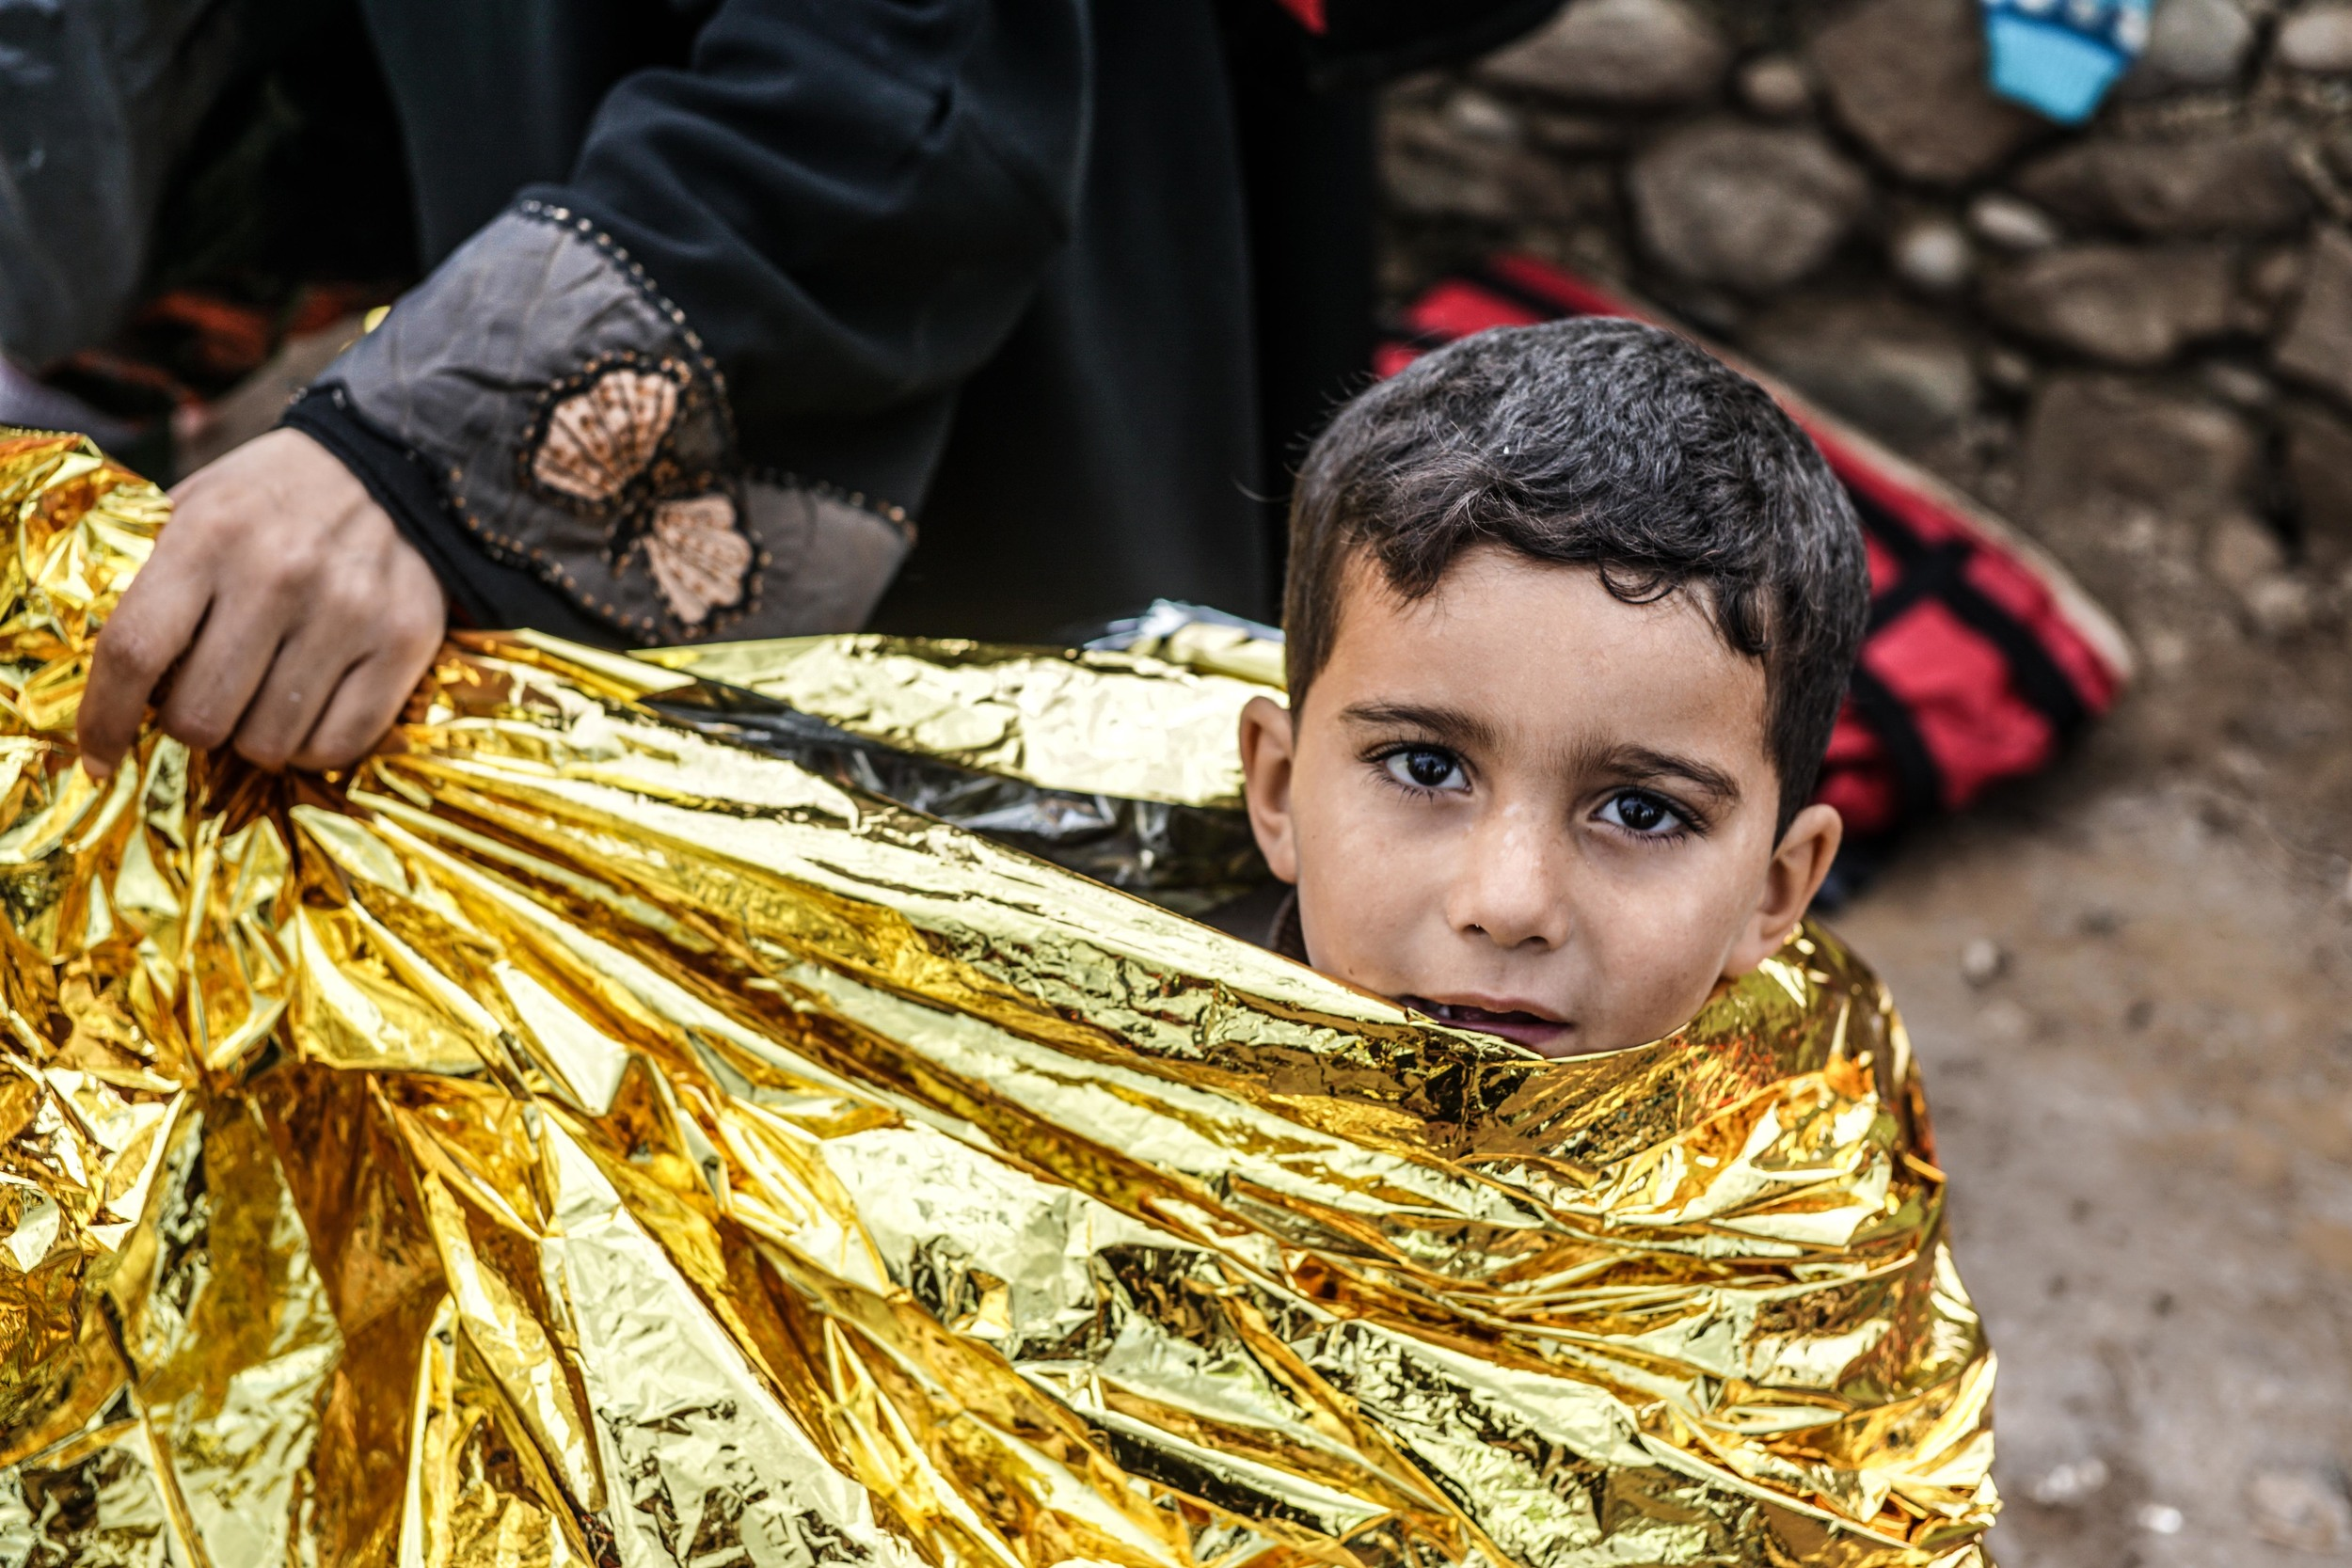 Syrian Refugee Crisis Lesbos Greece November 2015 21.jpg